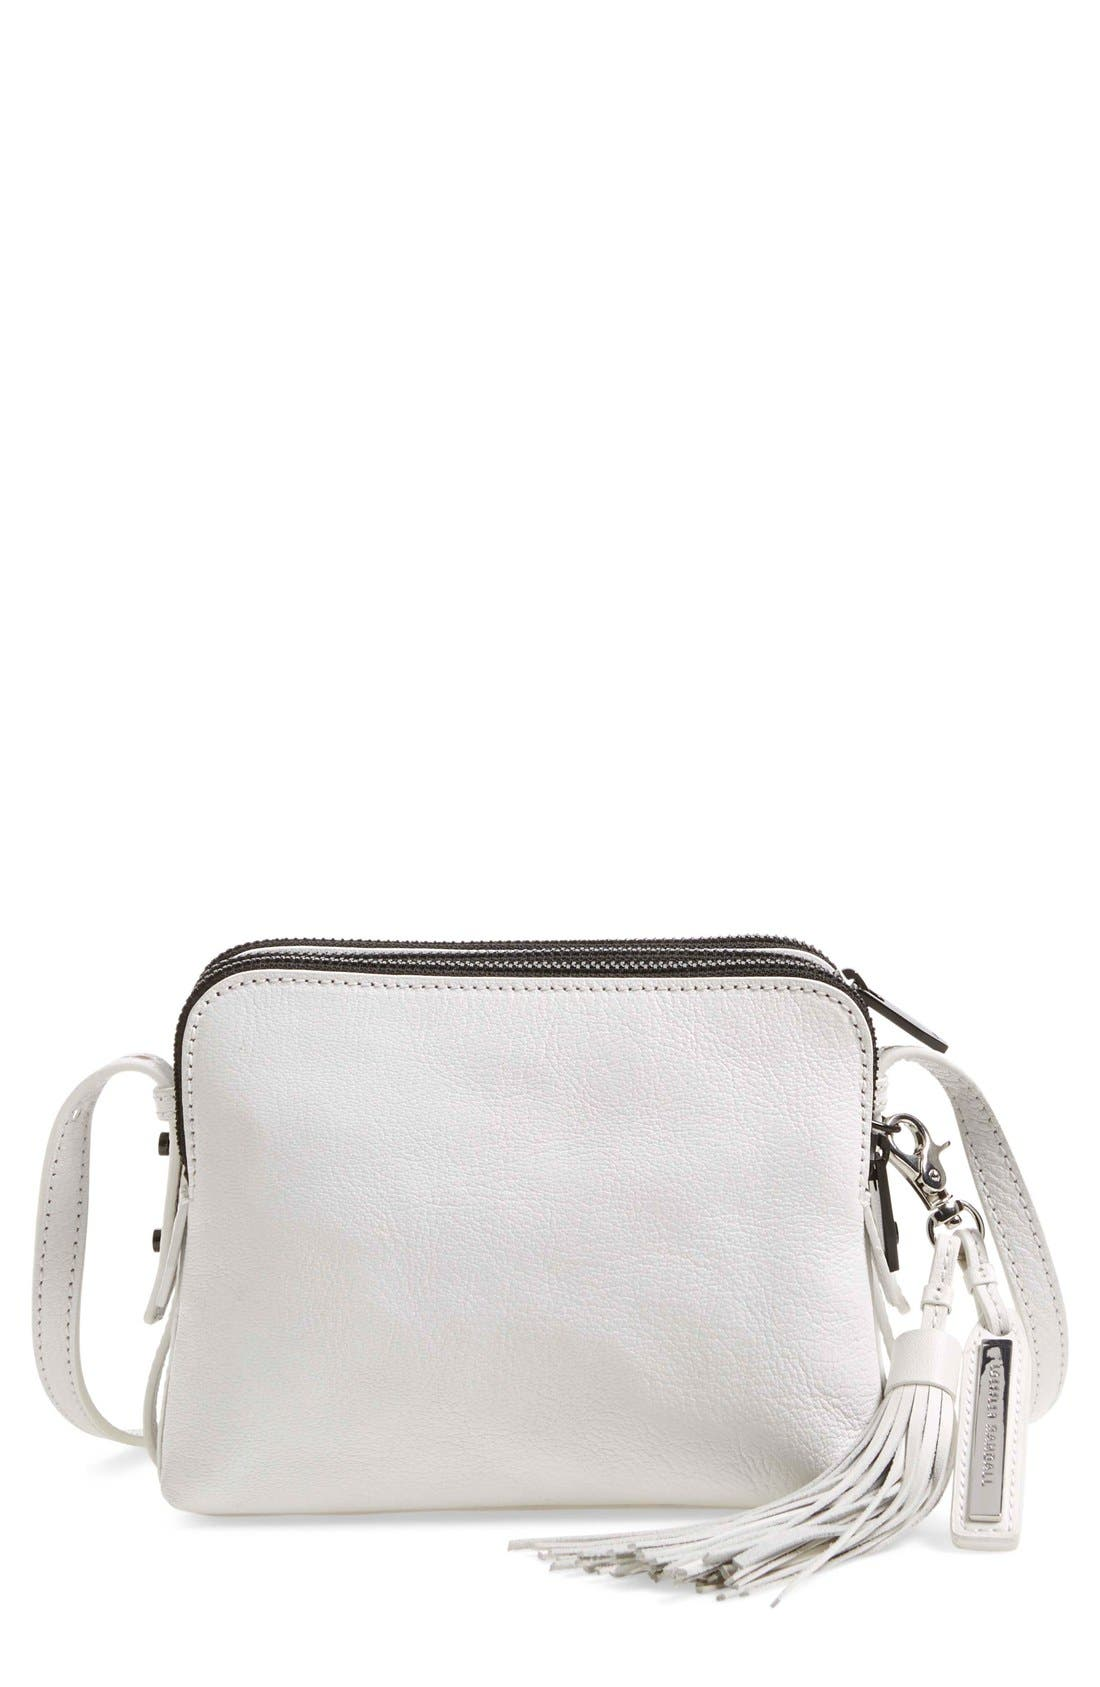 Alternate Image 1 Selected - Loeffler Randall Double Zip Leather Crossbody Bag